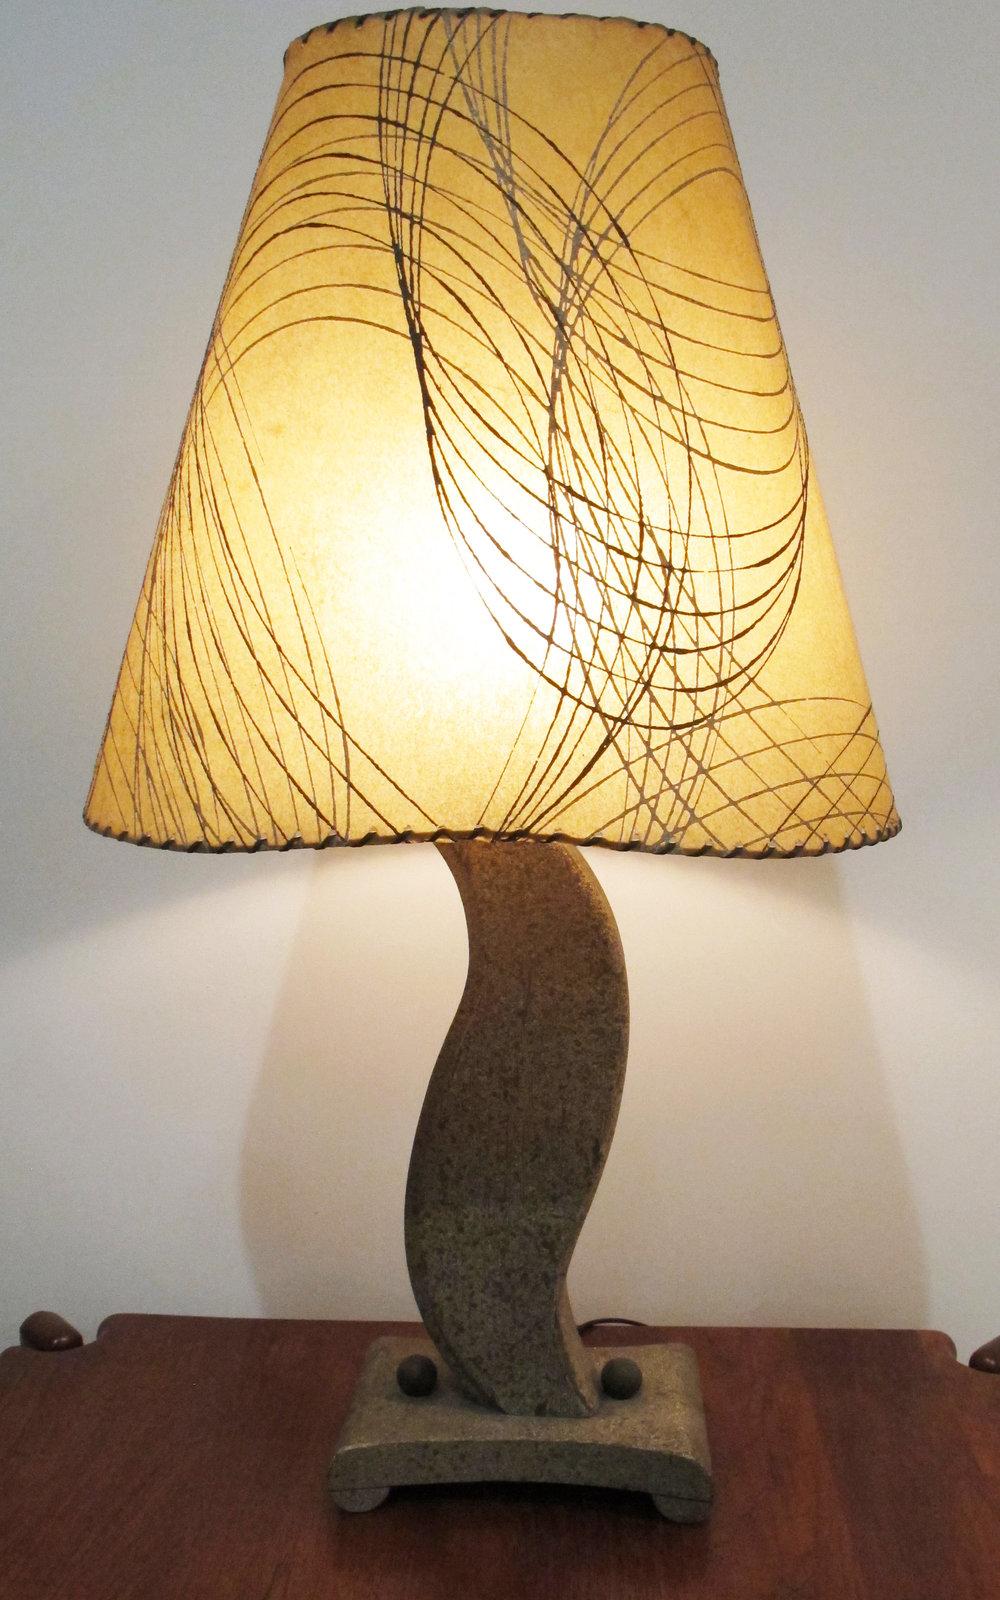 MID CENTURY UNDULATING WOOD LAMP WITH FIBERGLASS SHADE